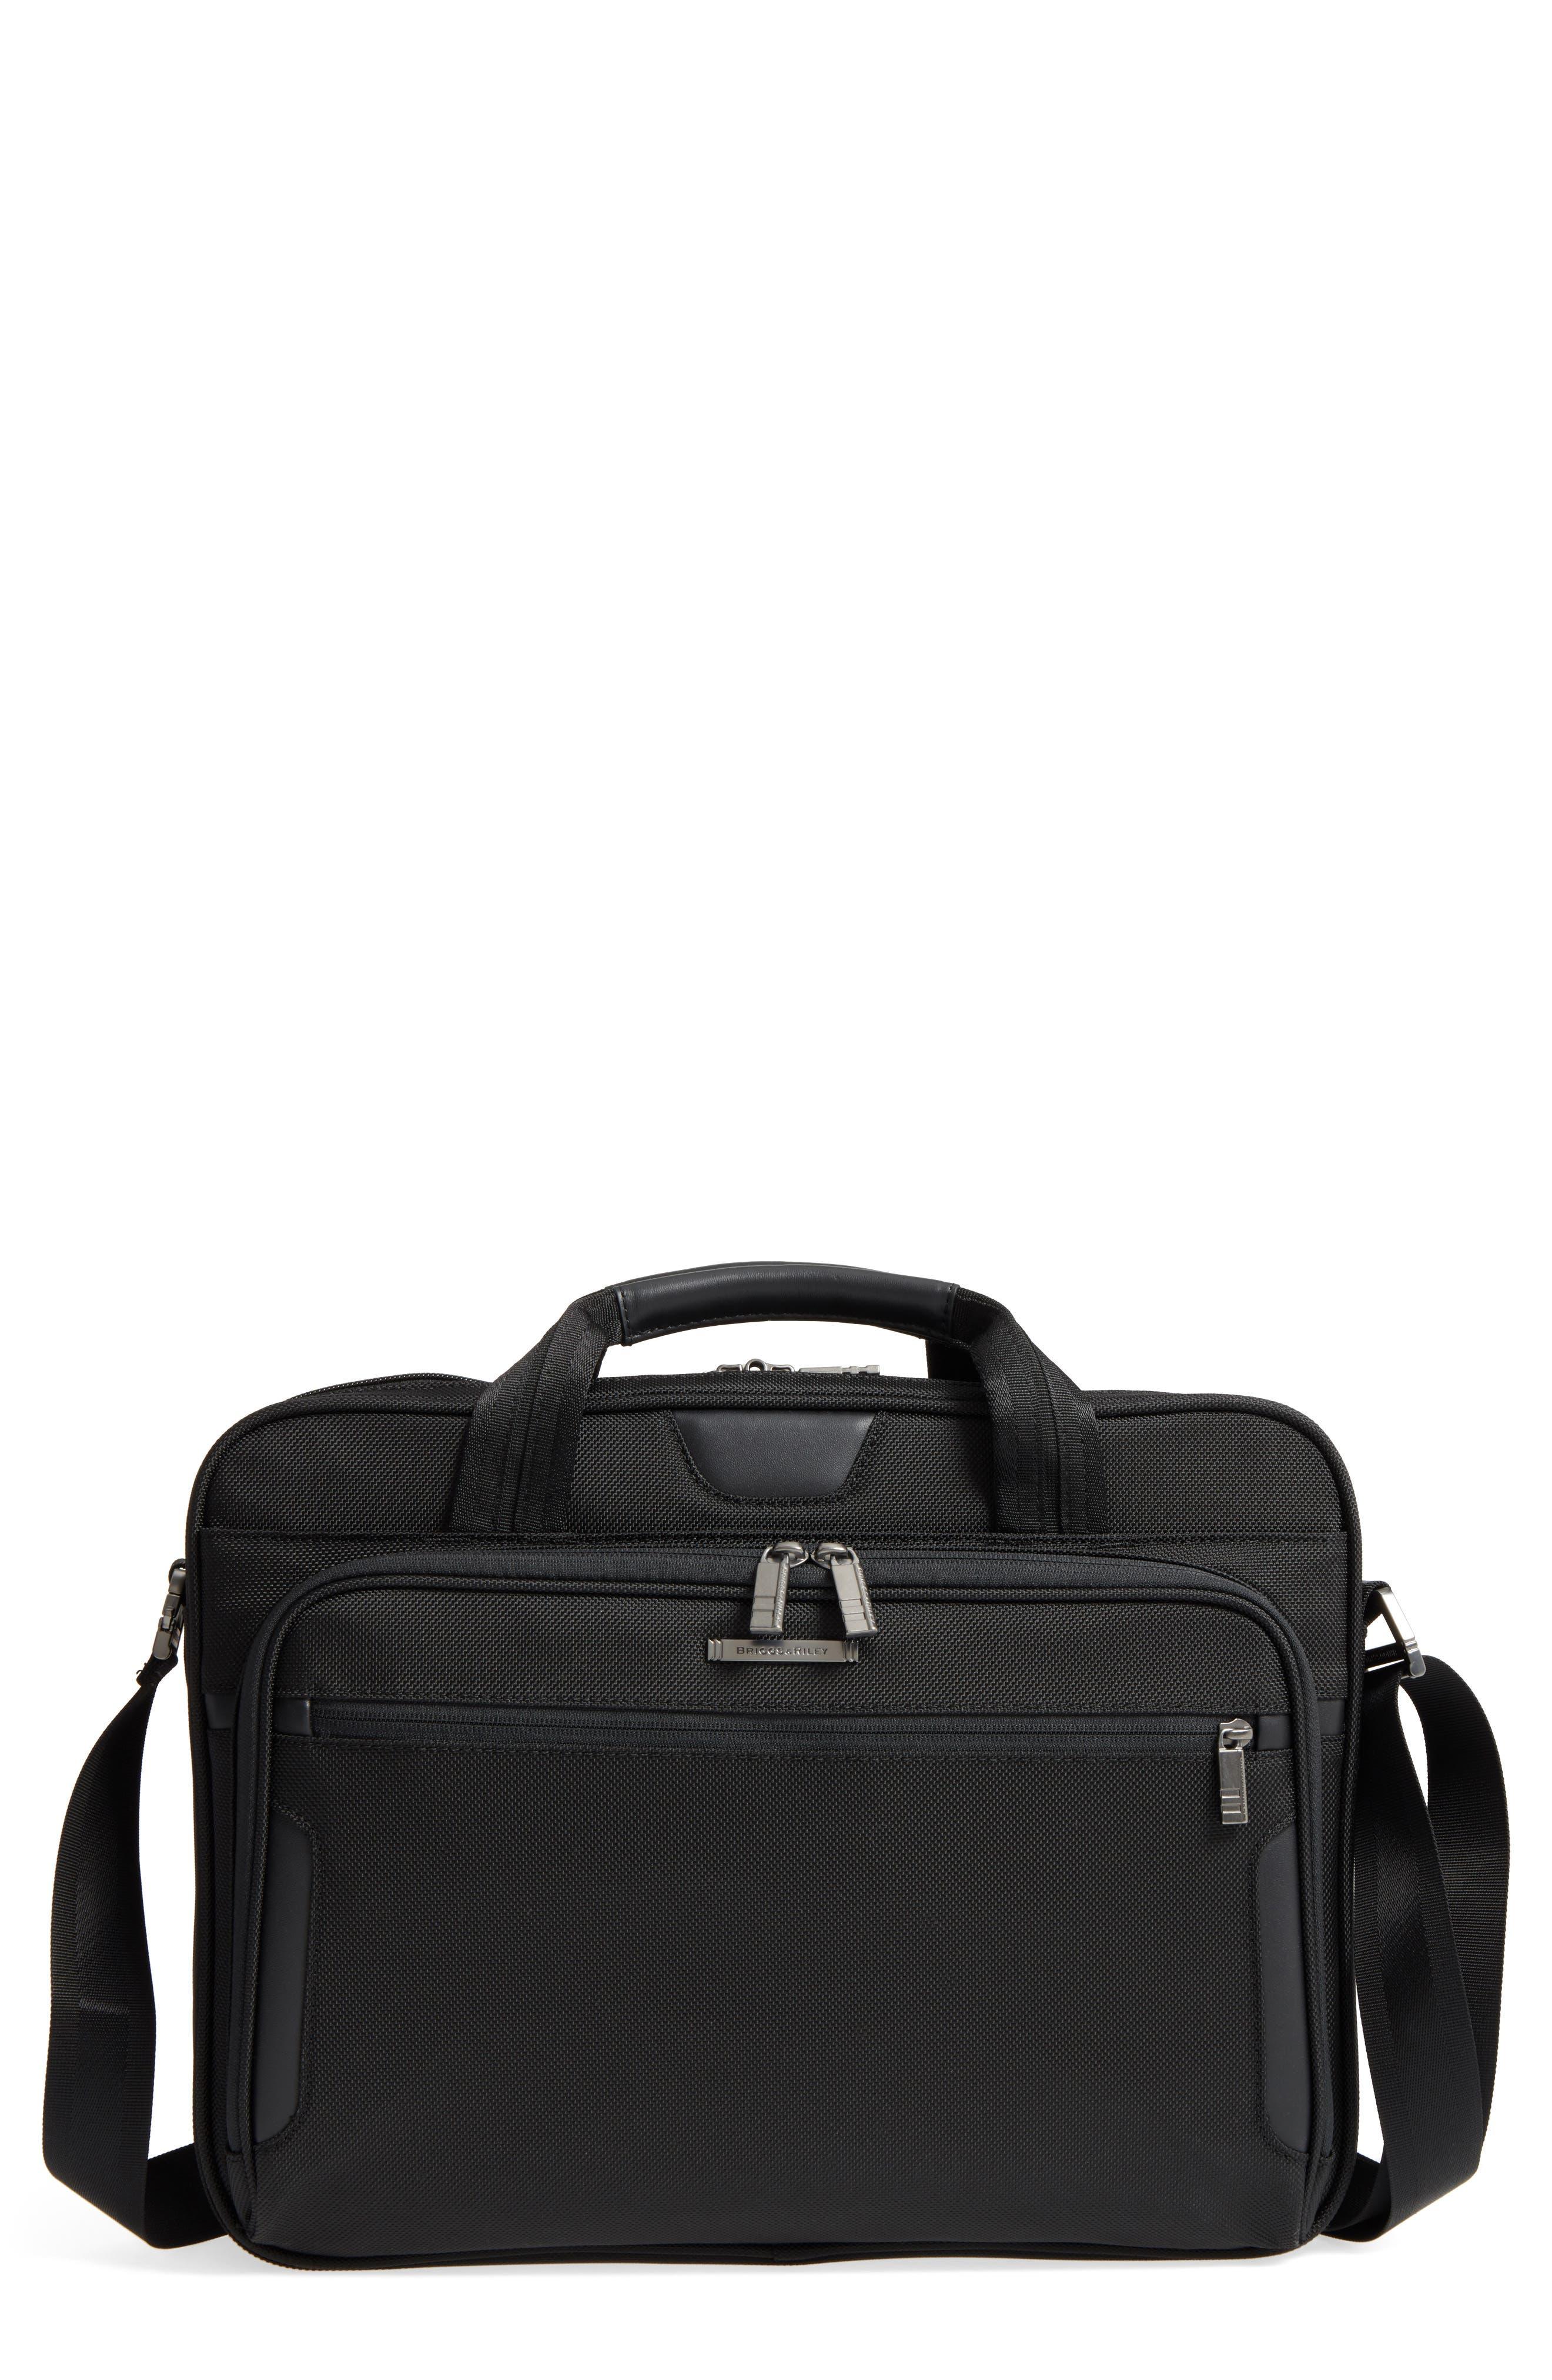 'Medium' Ballistic Nylon Briefcase,                             Alternate thumbnail 2, color,                             004